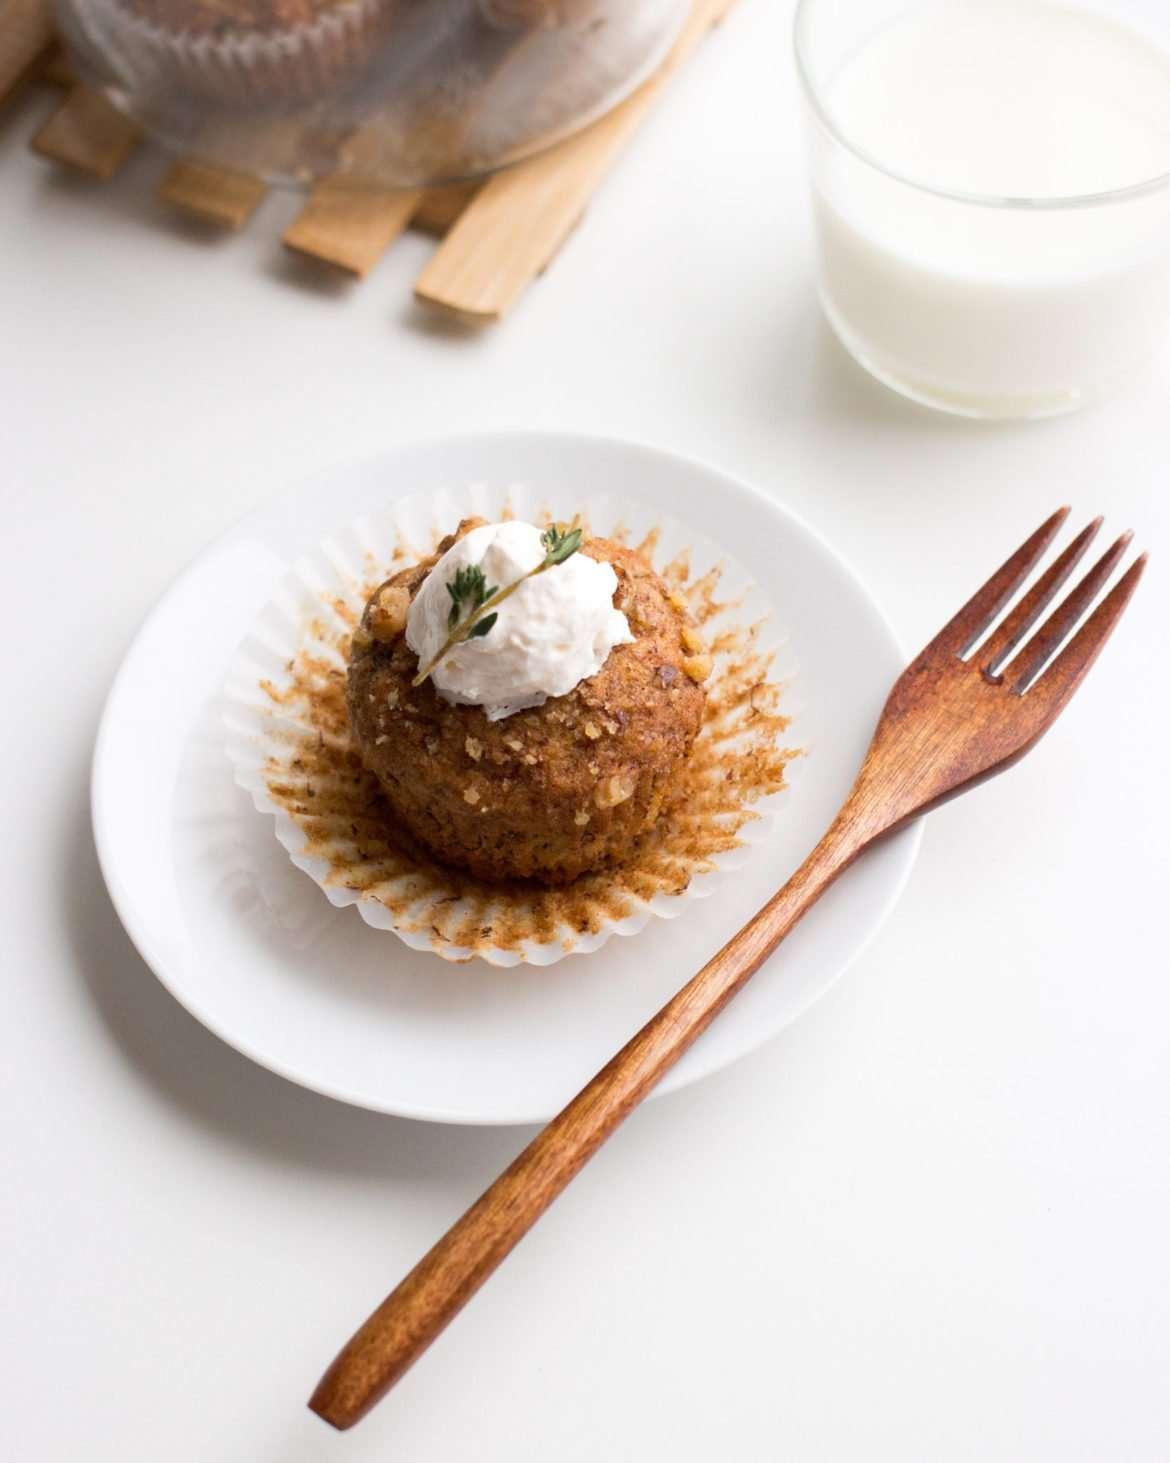 photo of banana nut muffin